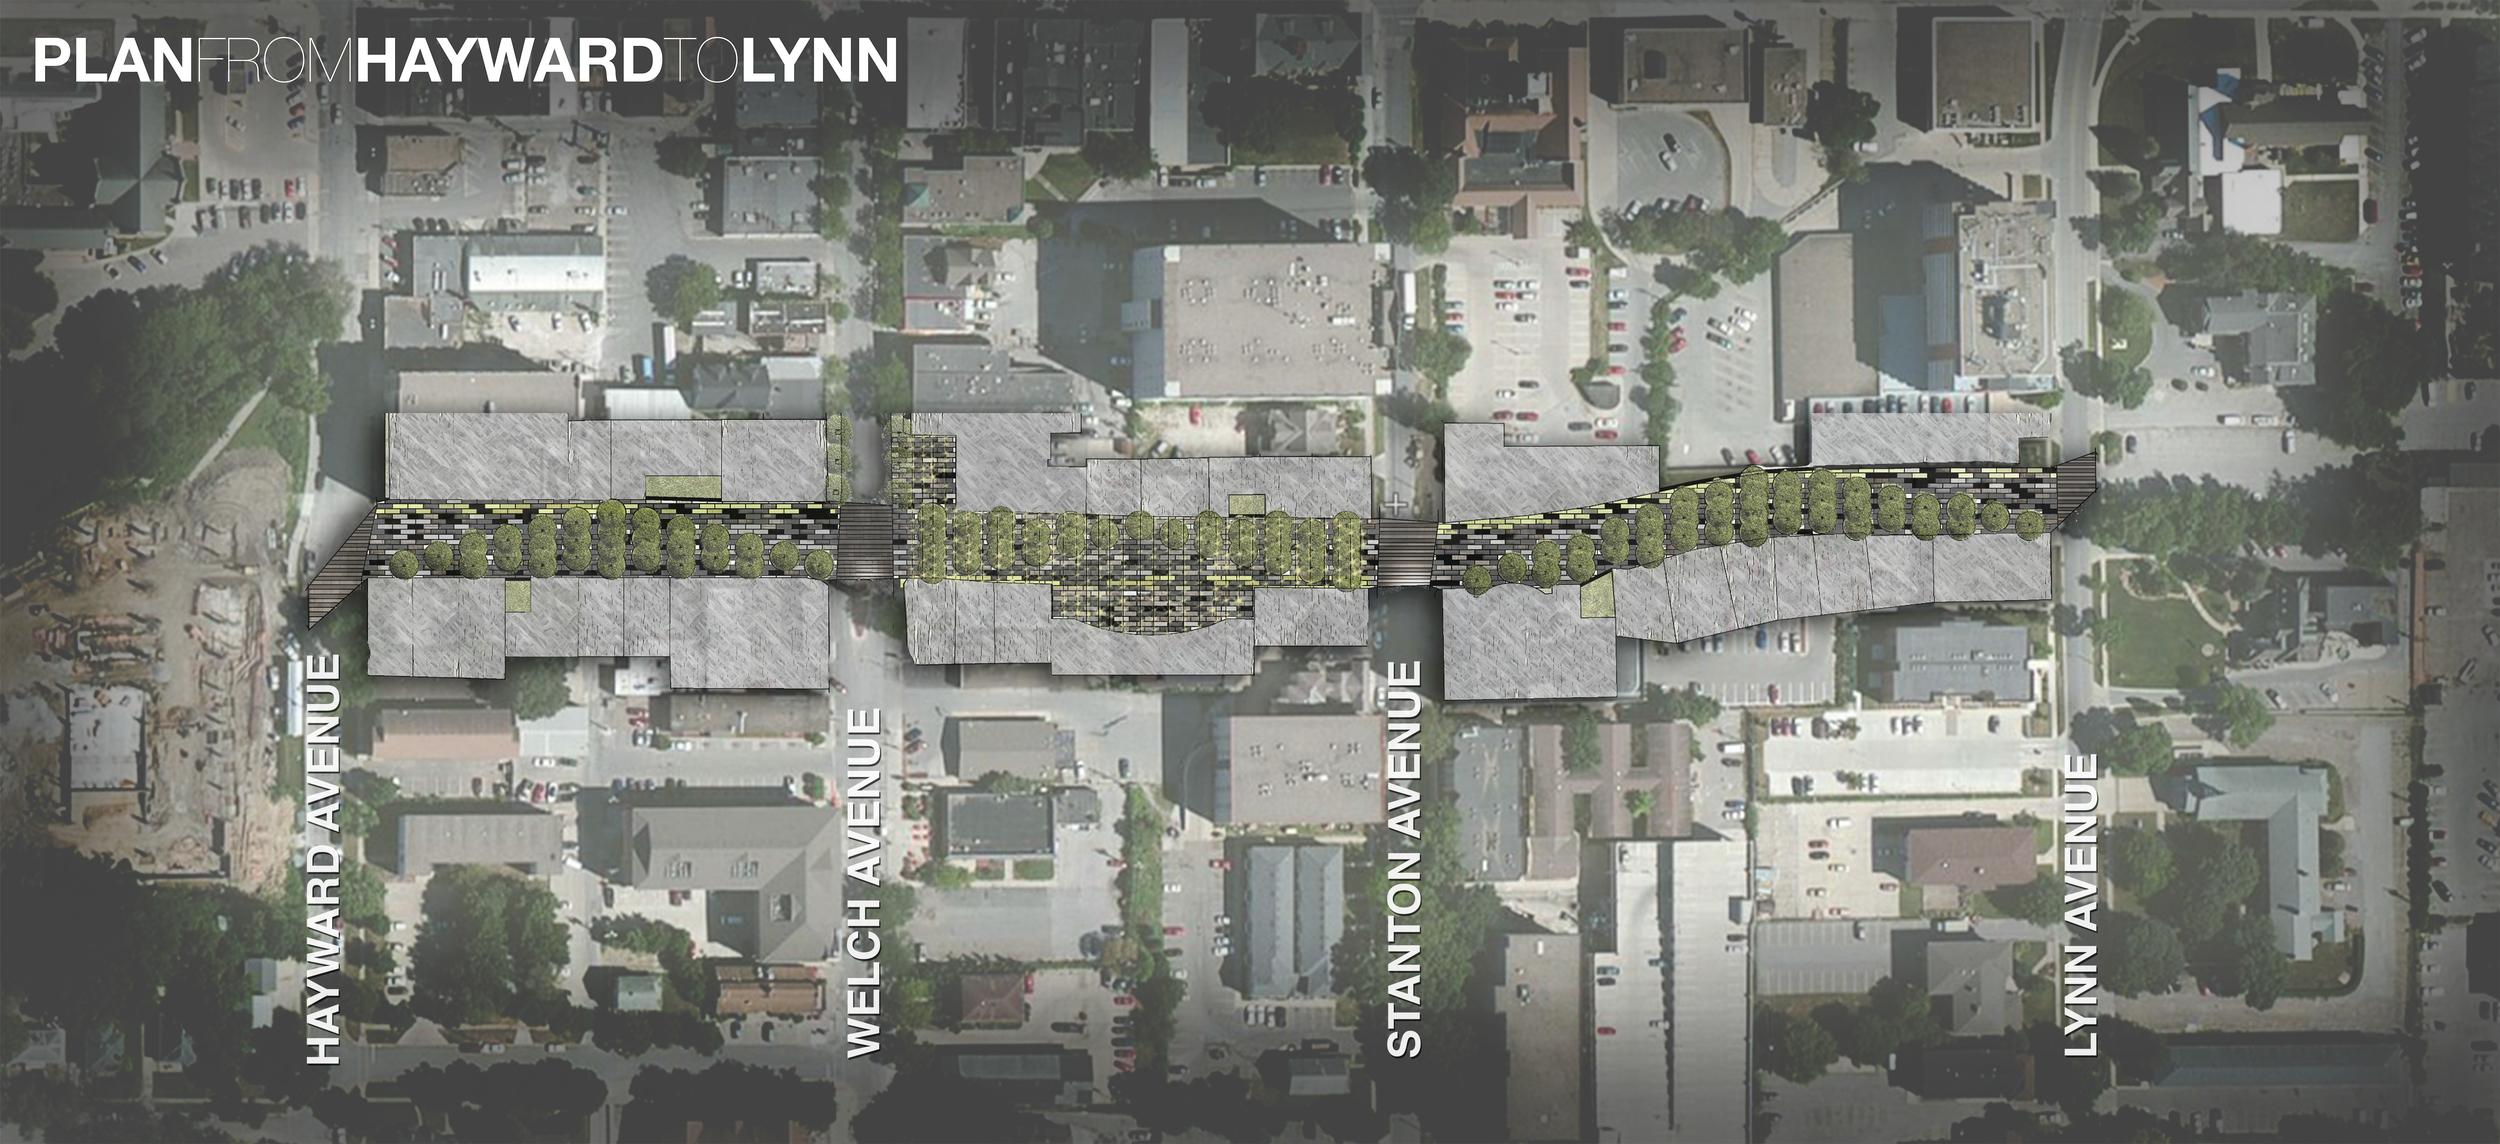 Decorative Plan of the Chamberlain Pedestrian Mall Proposal.